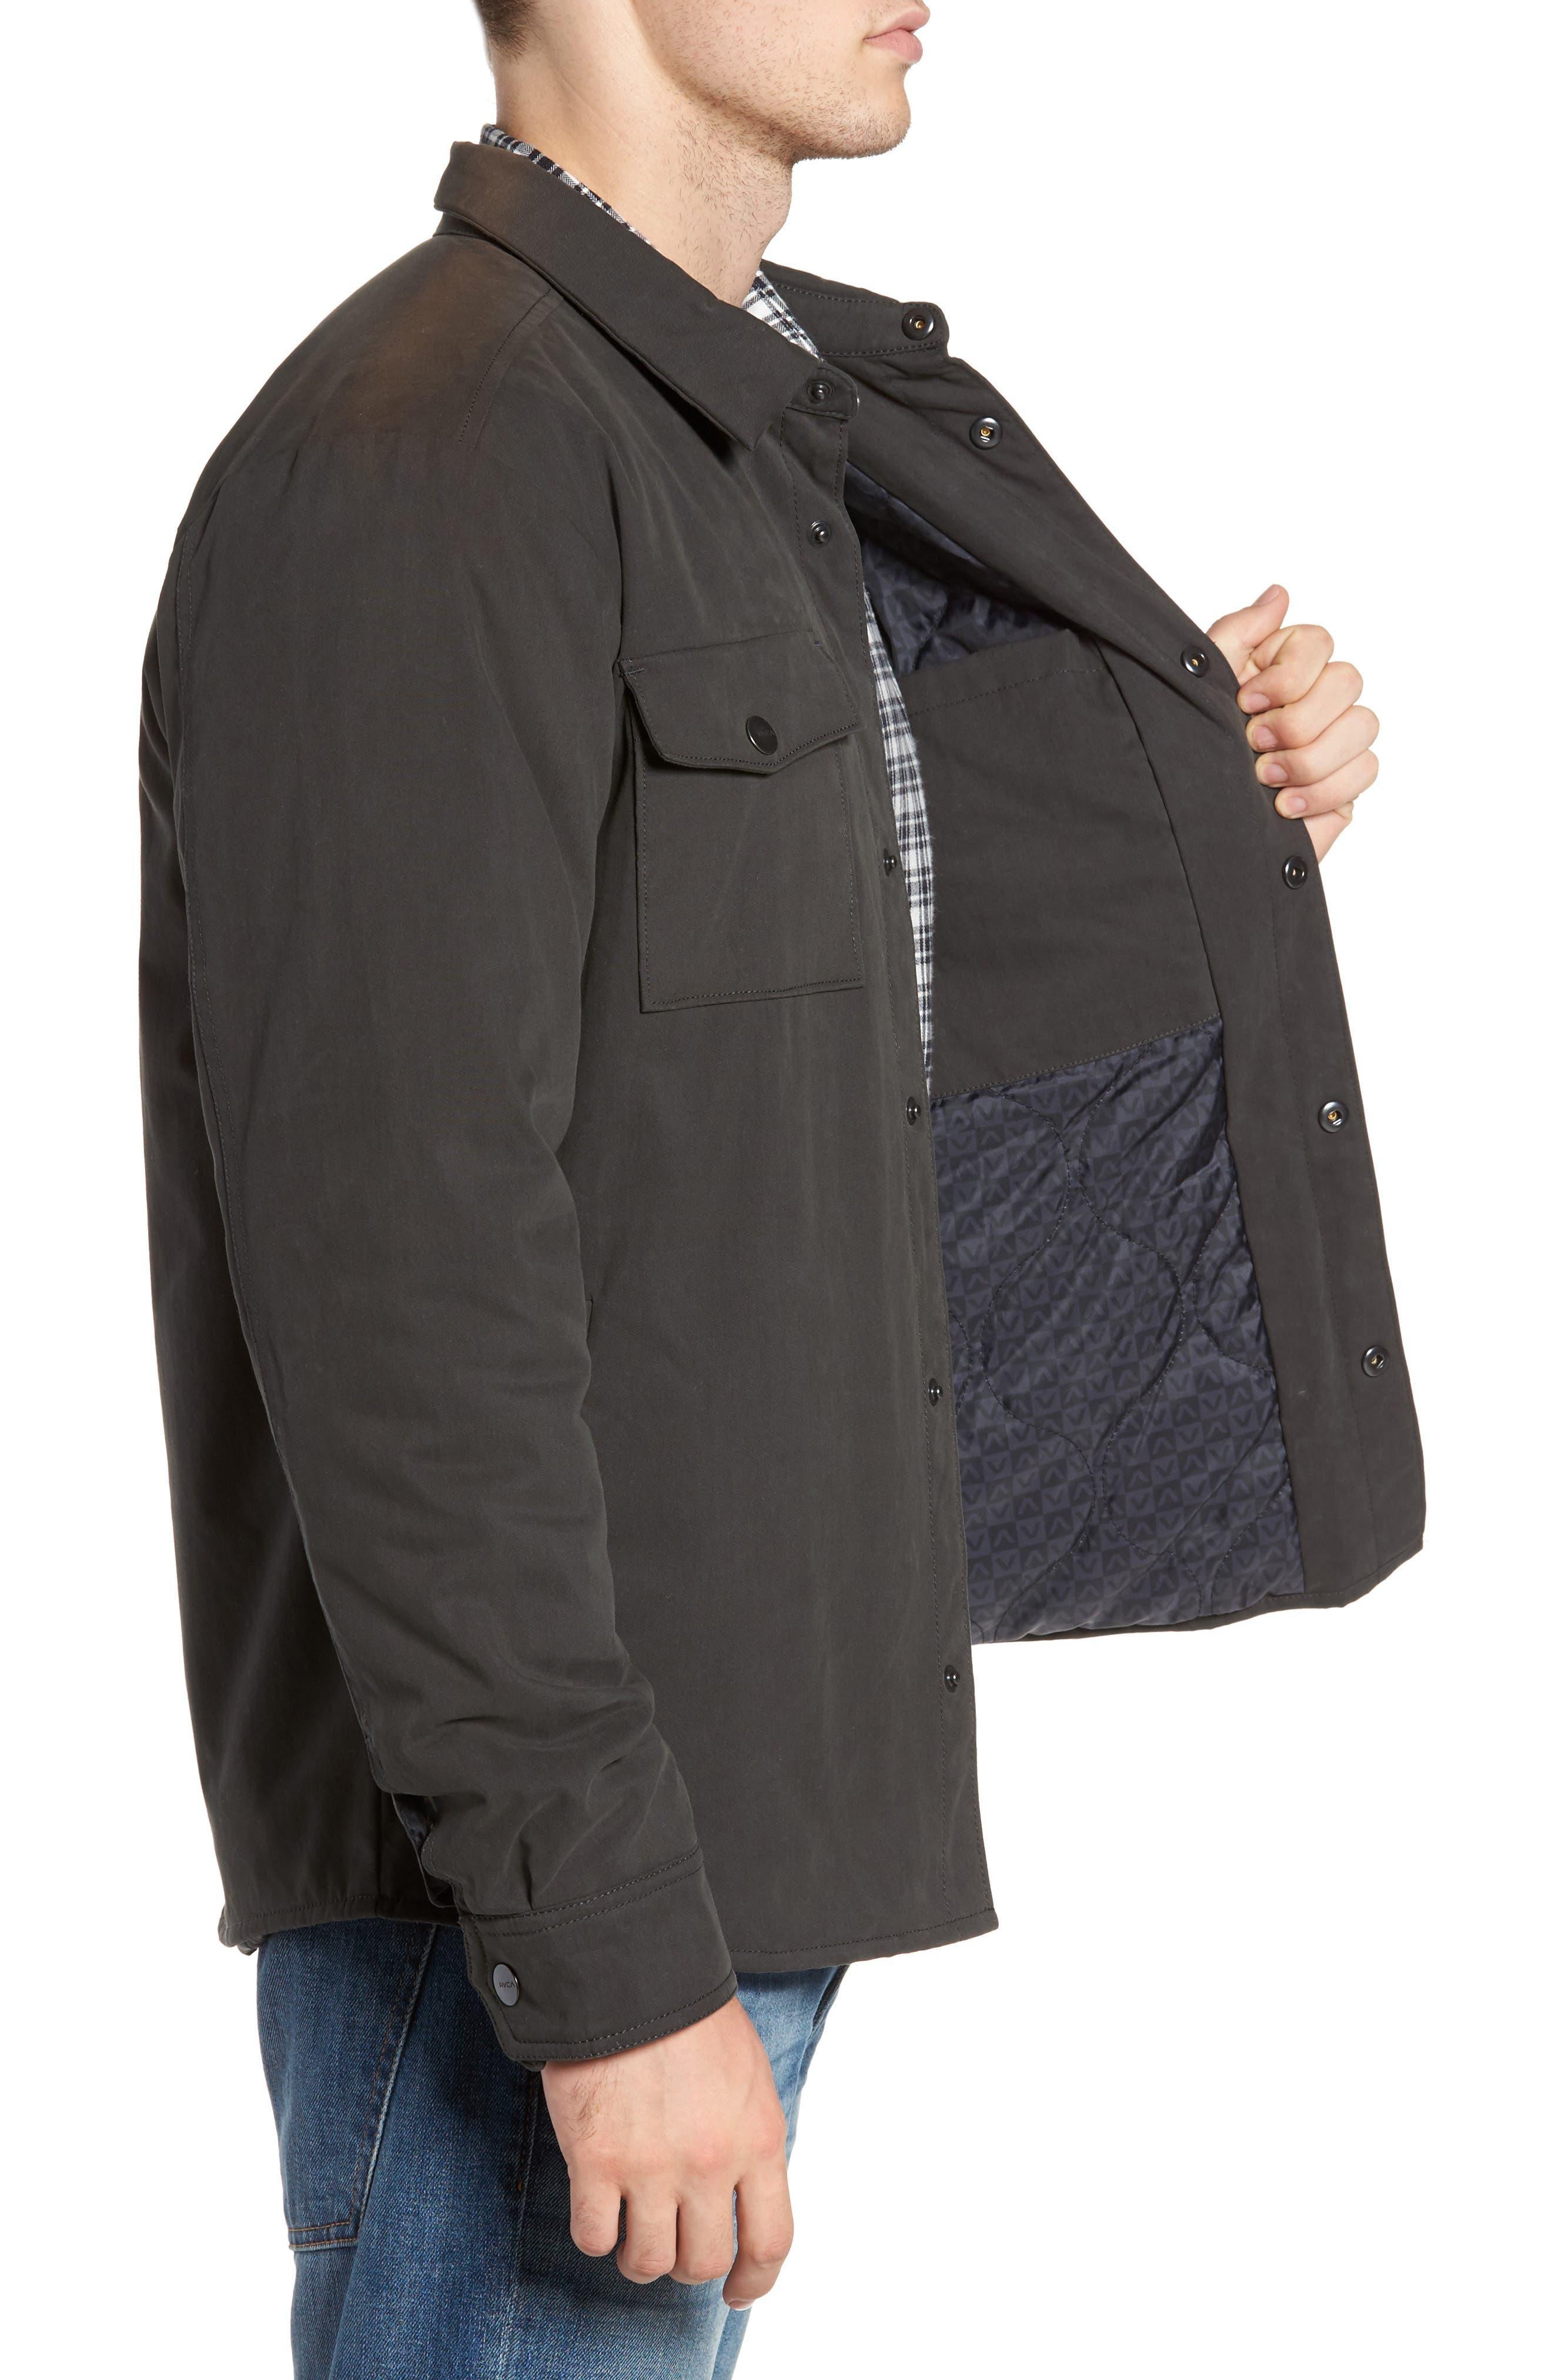 Officer's Shirt Jacket,                             Alternate thumbnail 3, color,                             Pirate Black